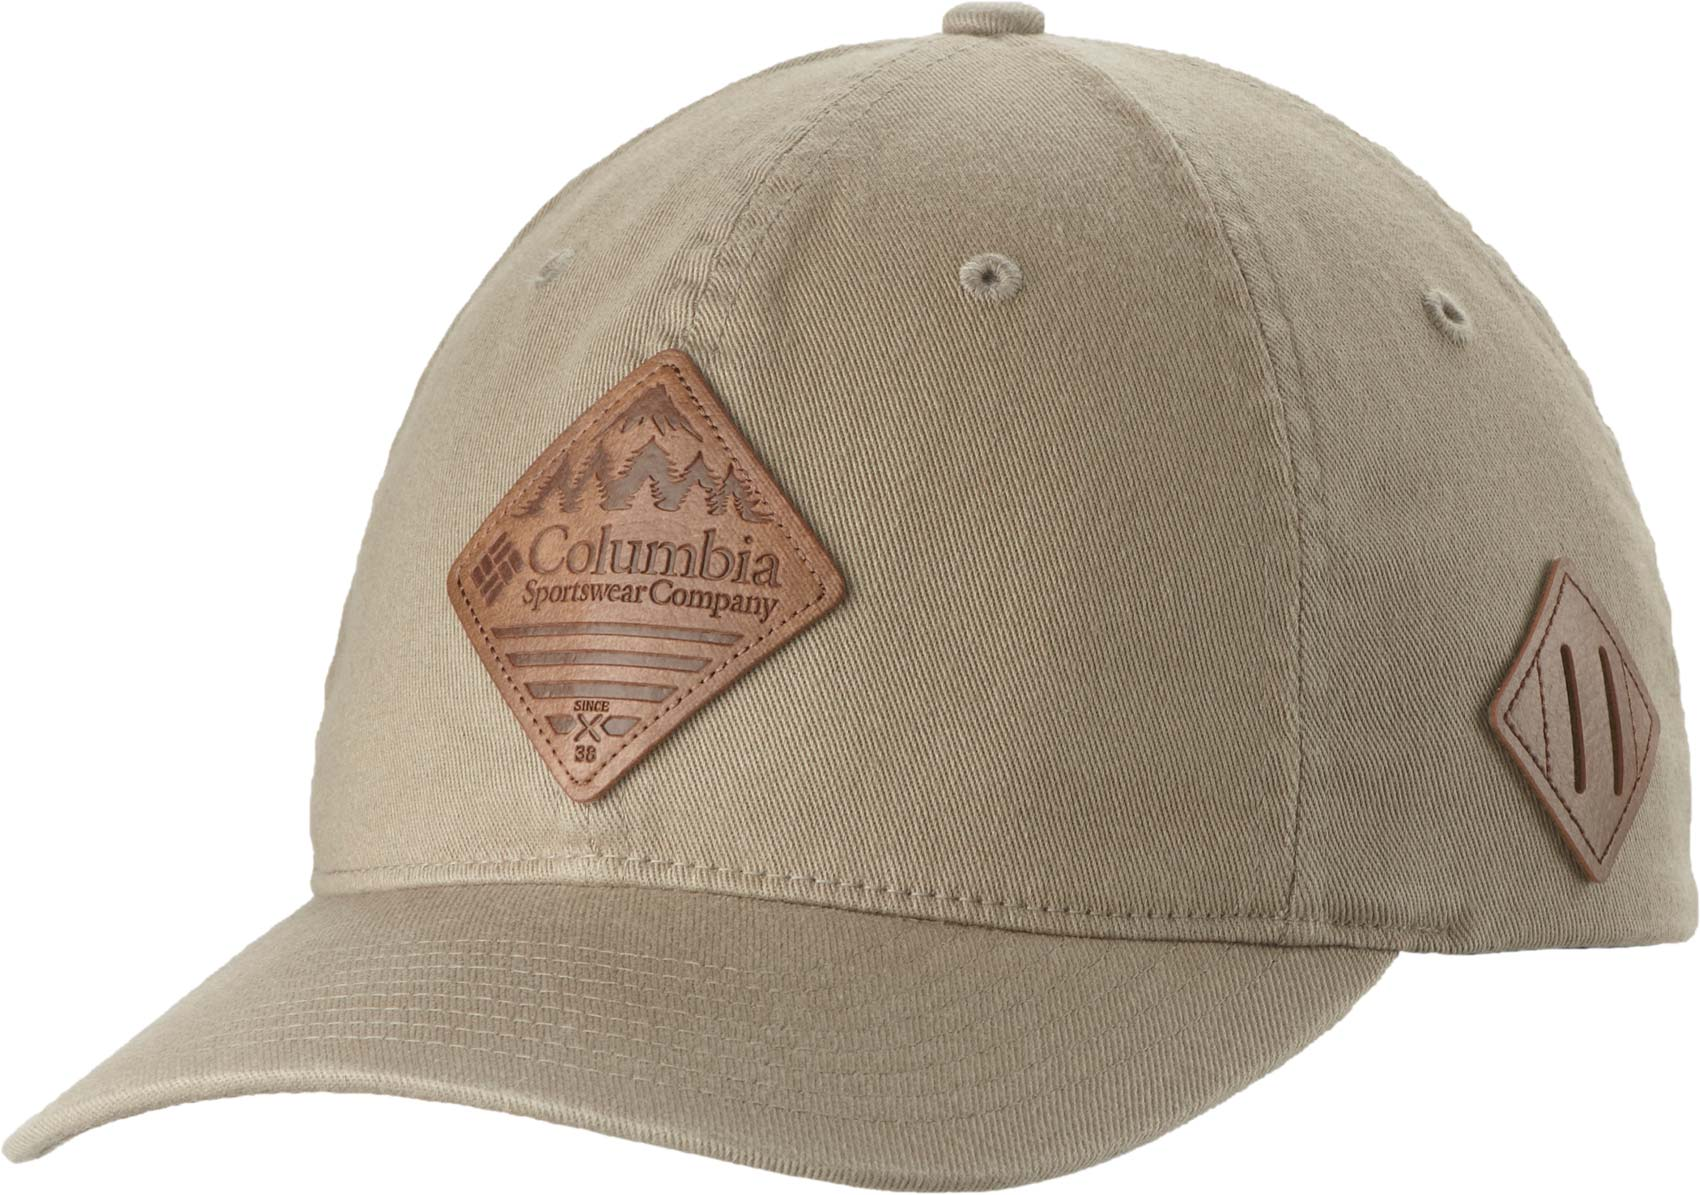 e3ba271f62e Columbia RUGGED OUTDOOR HAT. Men s baseball cap